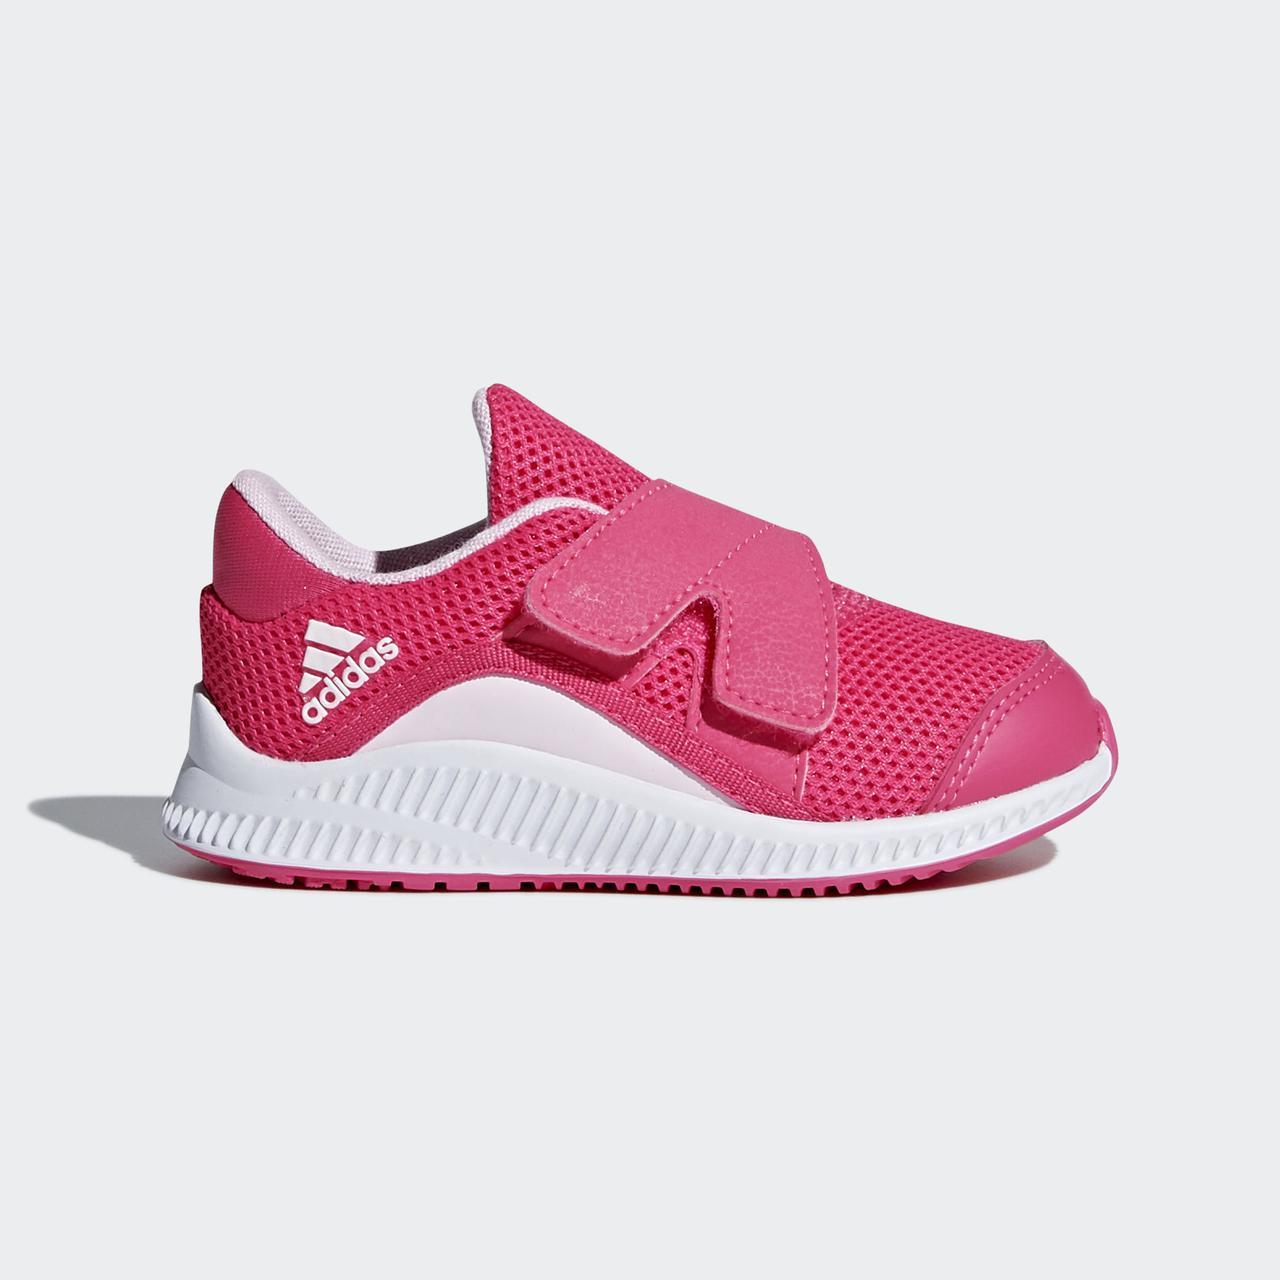 6d74e848 Купить Детские кроссовки Adidas Performance Fortarun X (Артикул ...